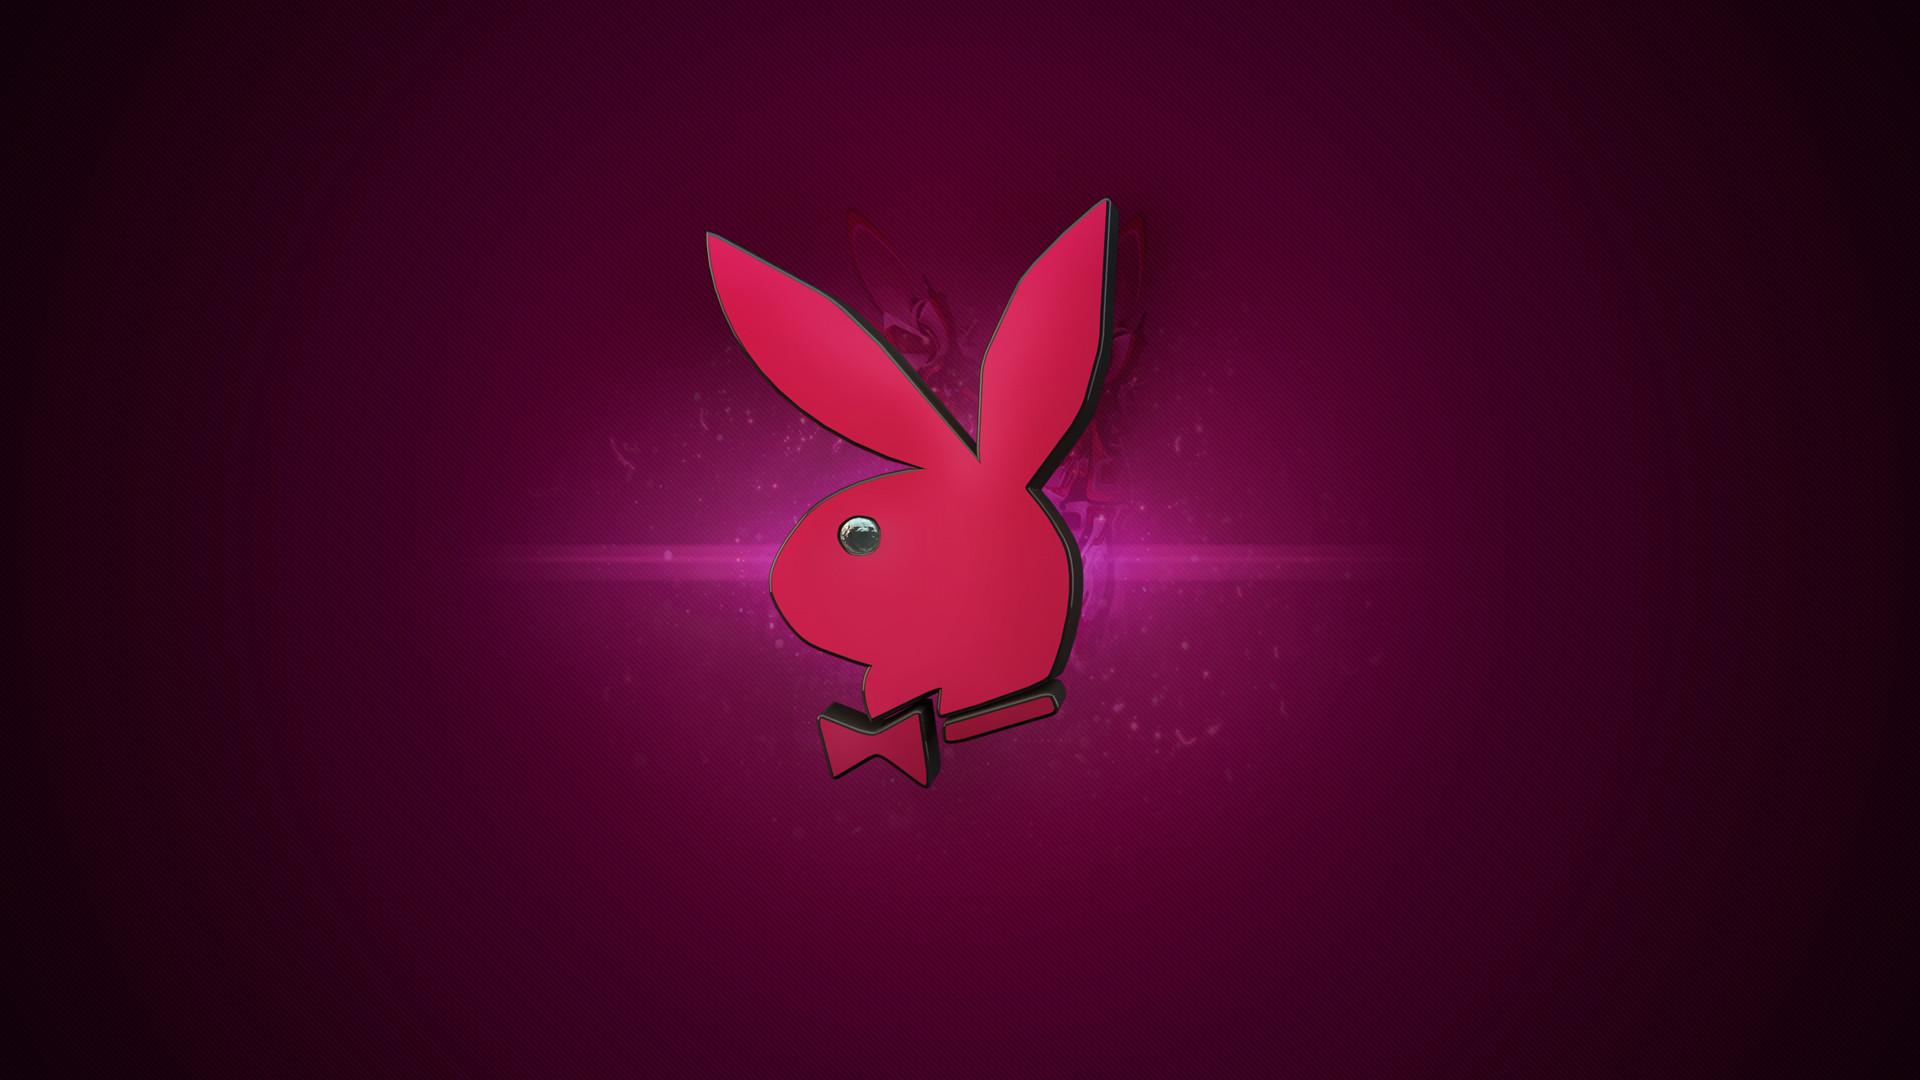 Playboy Bunny Logo Wallpapers – Hot Girls Wallpaper